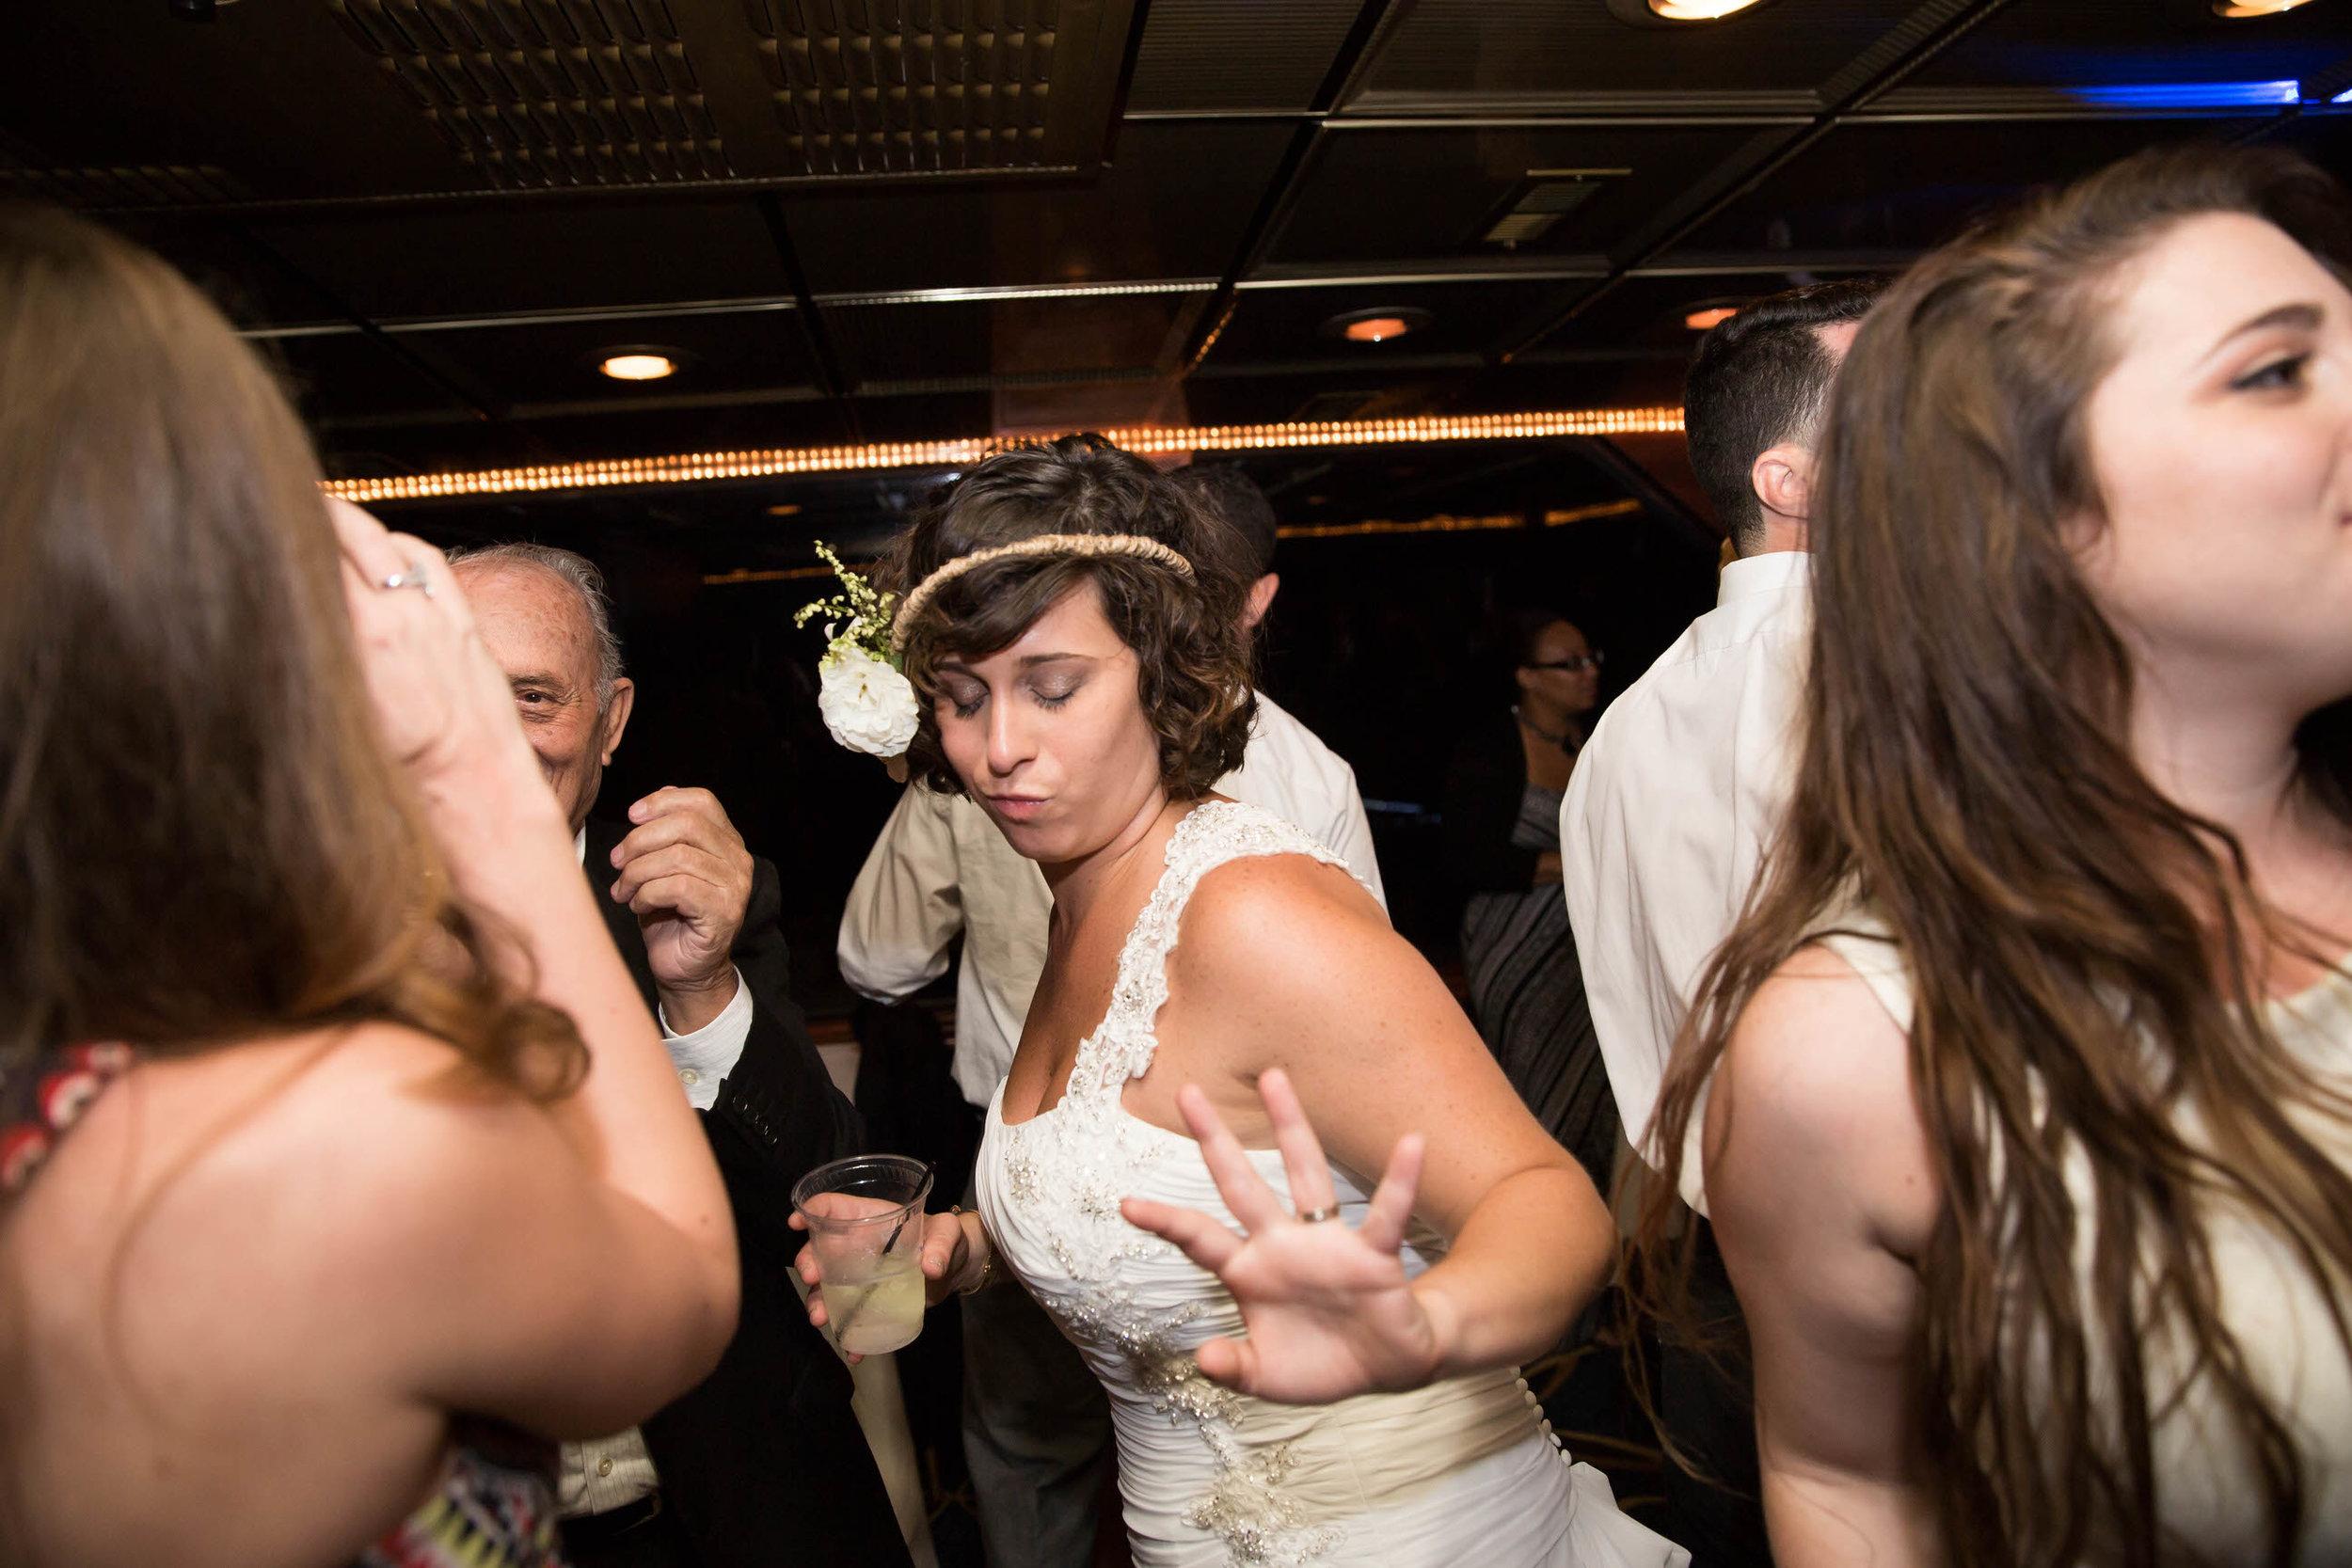 bride-dancing-boat-wedding-destination-photographer-tiny-house-photo.jpg